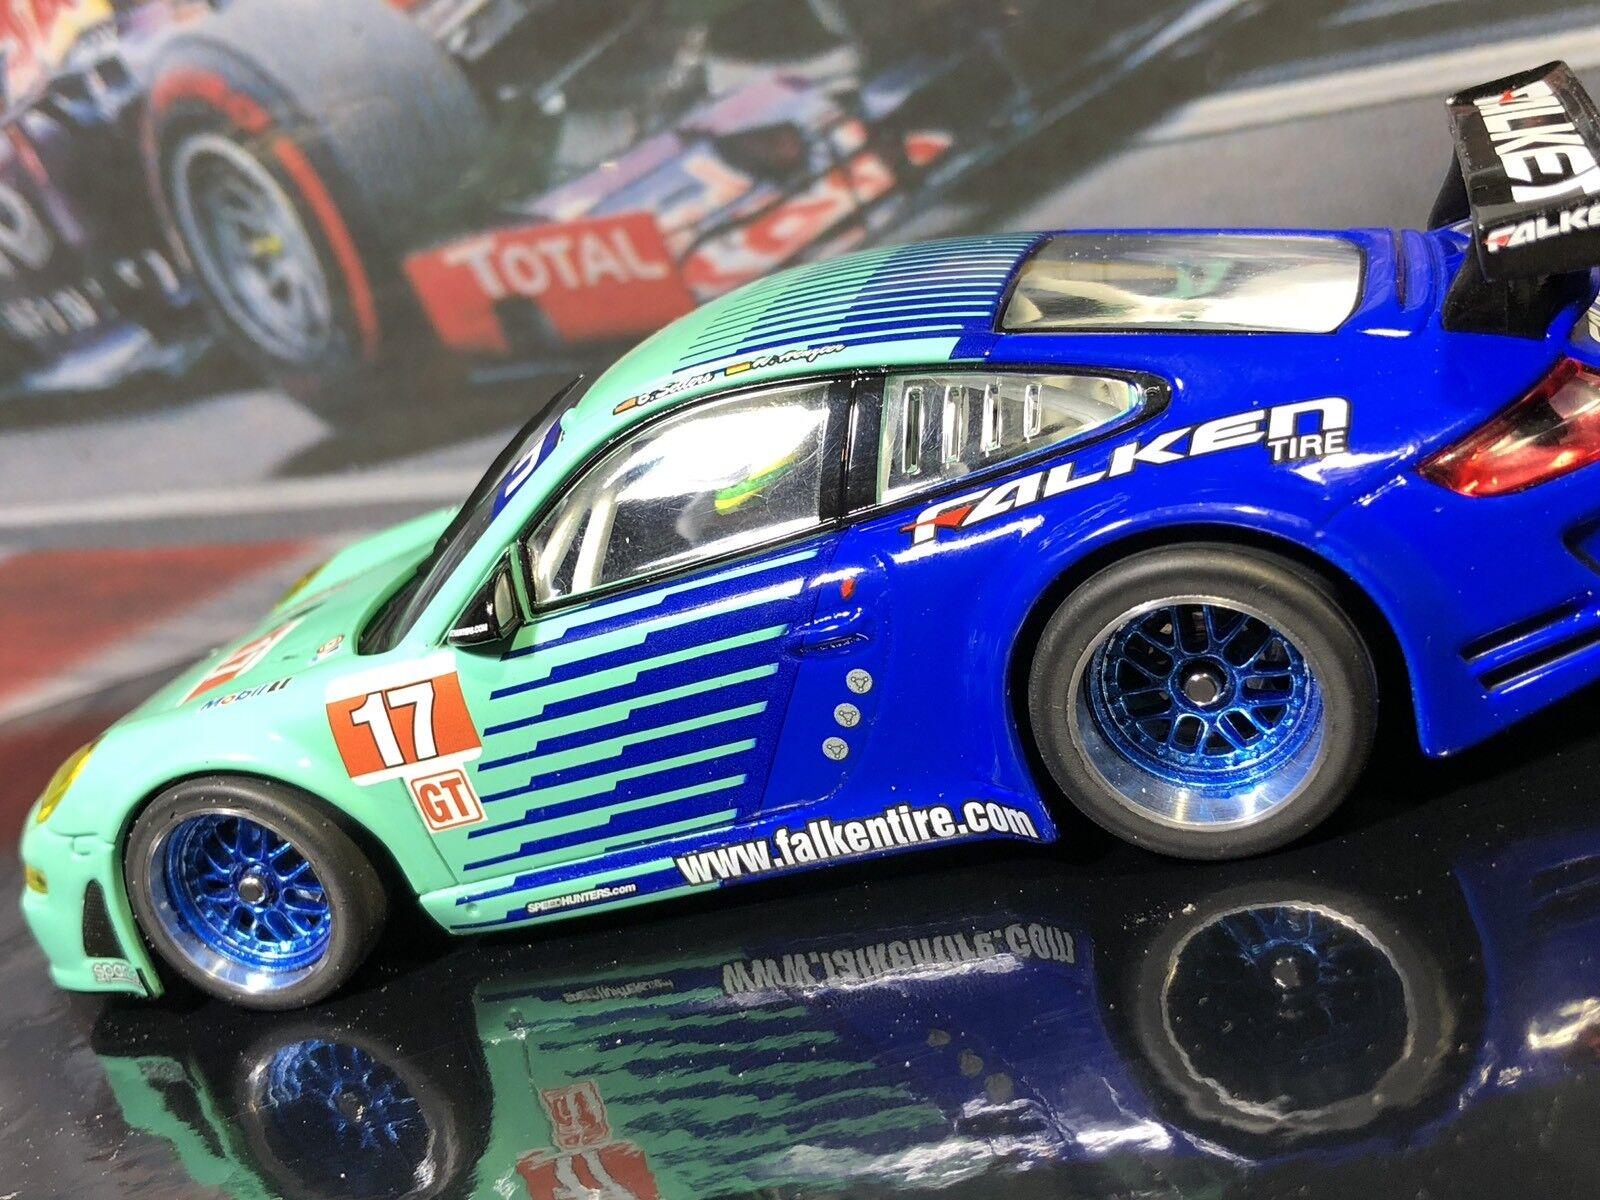 Carrera digital digital digital 132 Porsche GT3 extrem Tuning  | Guter weltweiter Ruf  4c796a